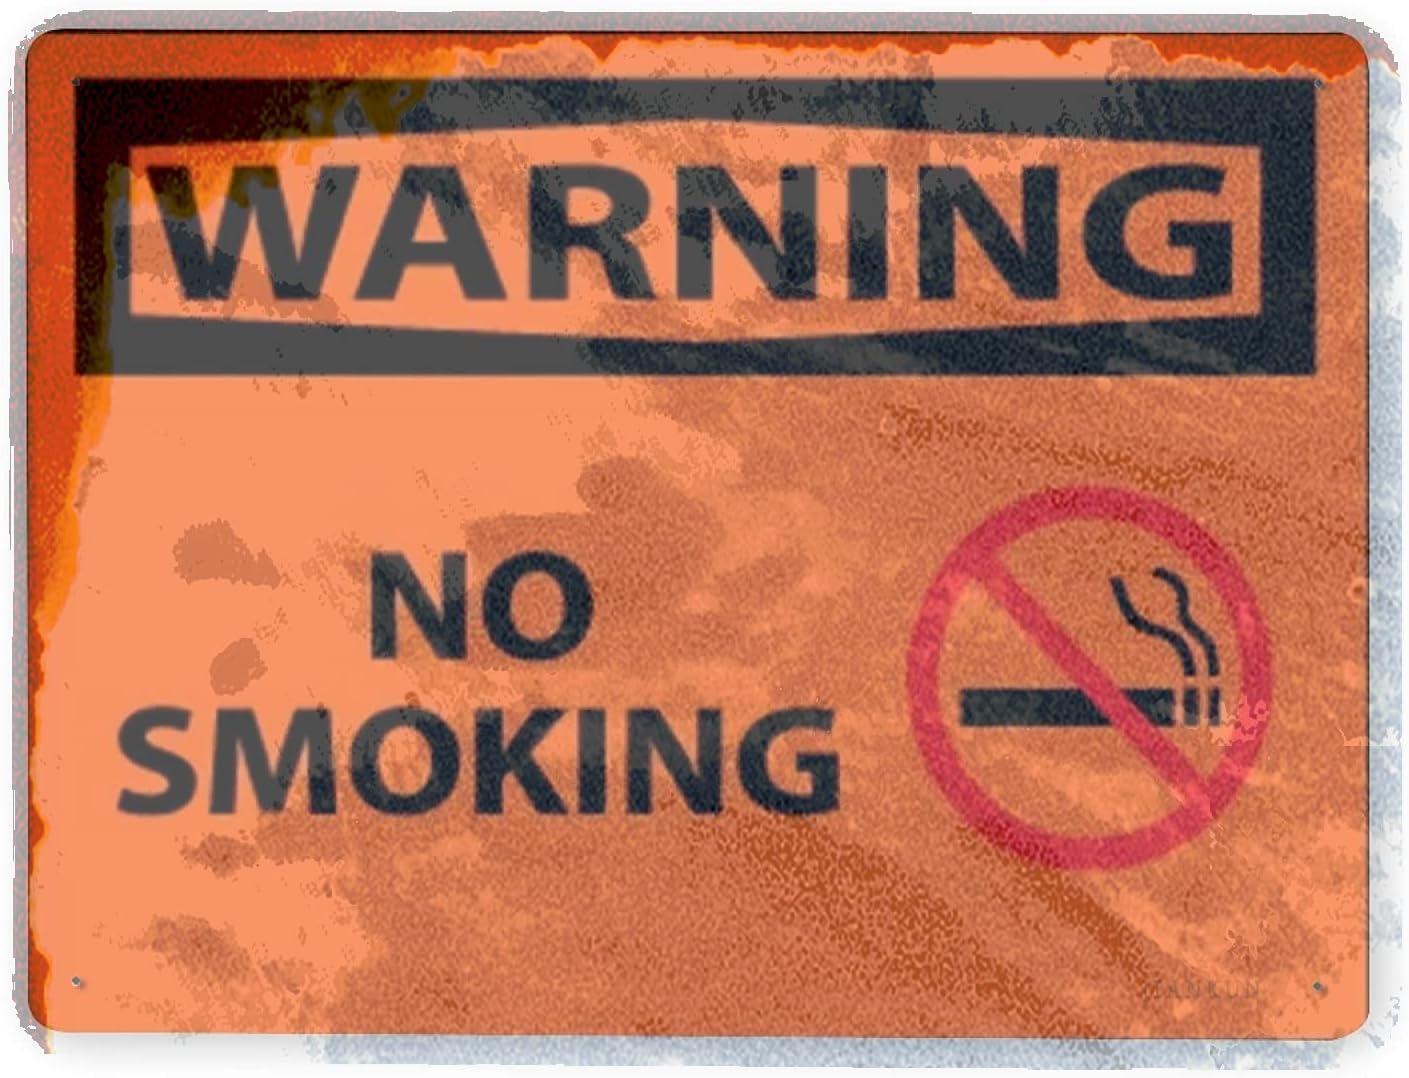 J.DXHYA Man Cave Decor 2 Smoking Pieces Sign Dedication No Ranking TOP10 Warning